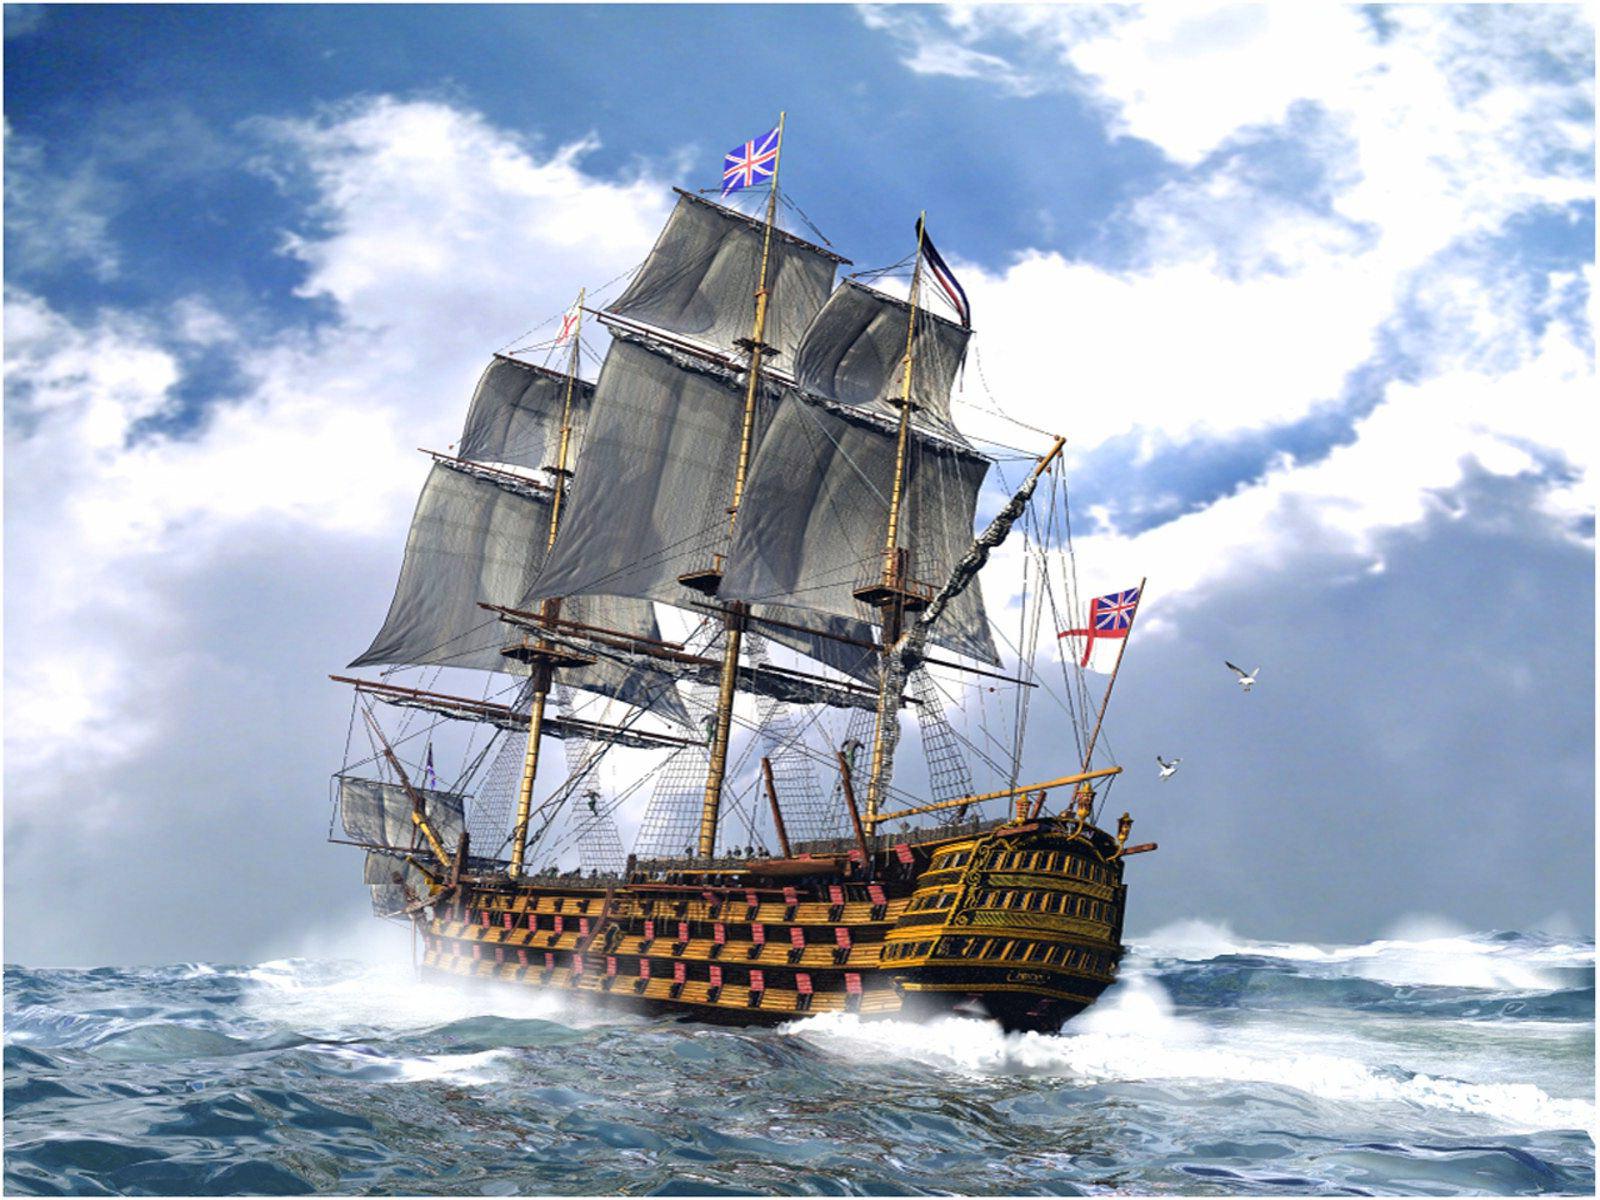 Best Wallpaper Collection Best Ship Wallpapers 1600x1200